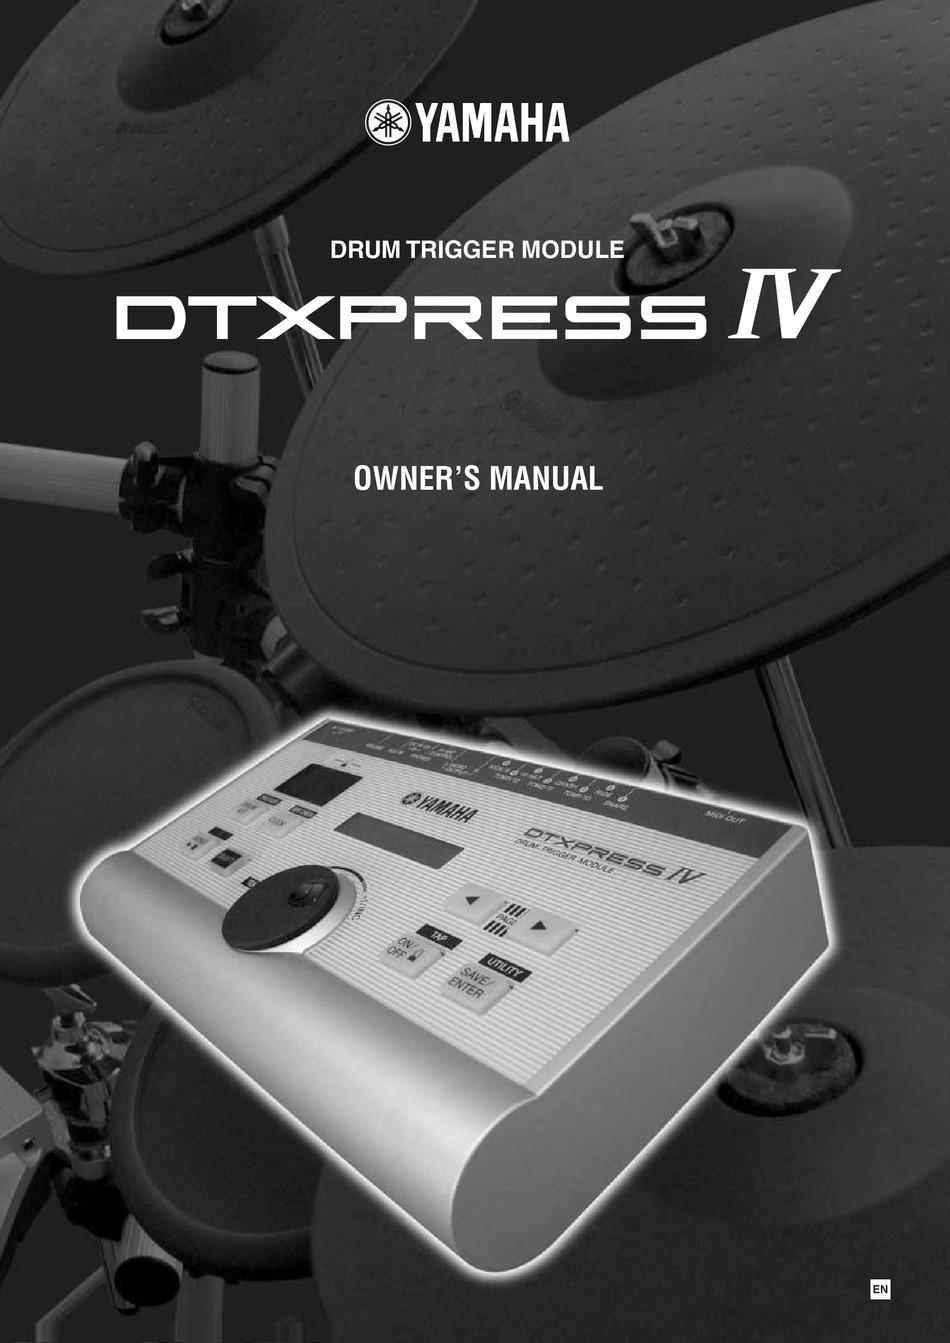 Yamaha Dtxpress Iv Owner S Manual Pdf Download Manualslib